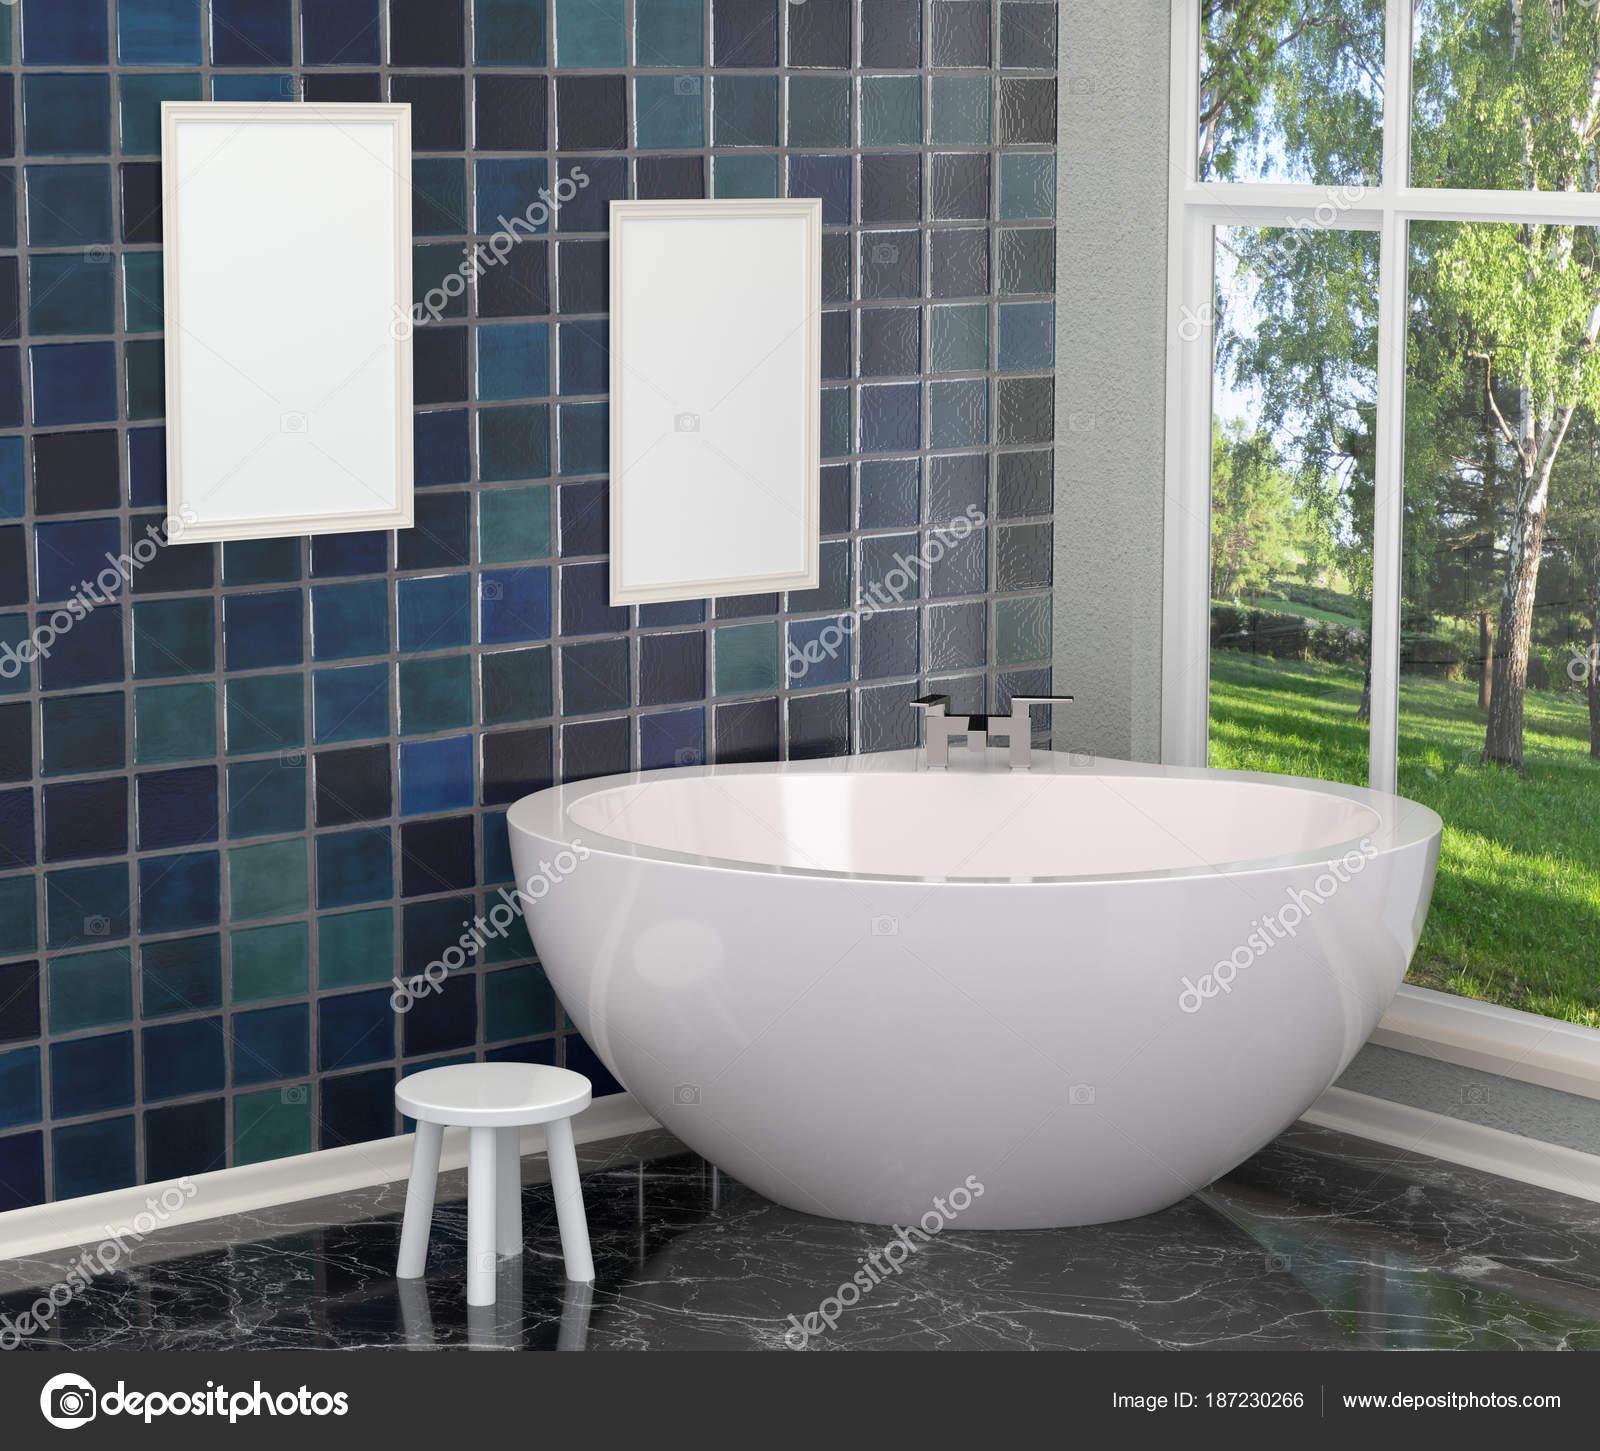 Salle De Bain Beige Meuble Taupe ~ blanc moderne salle de bain luxueuse dans la salle de bain avec